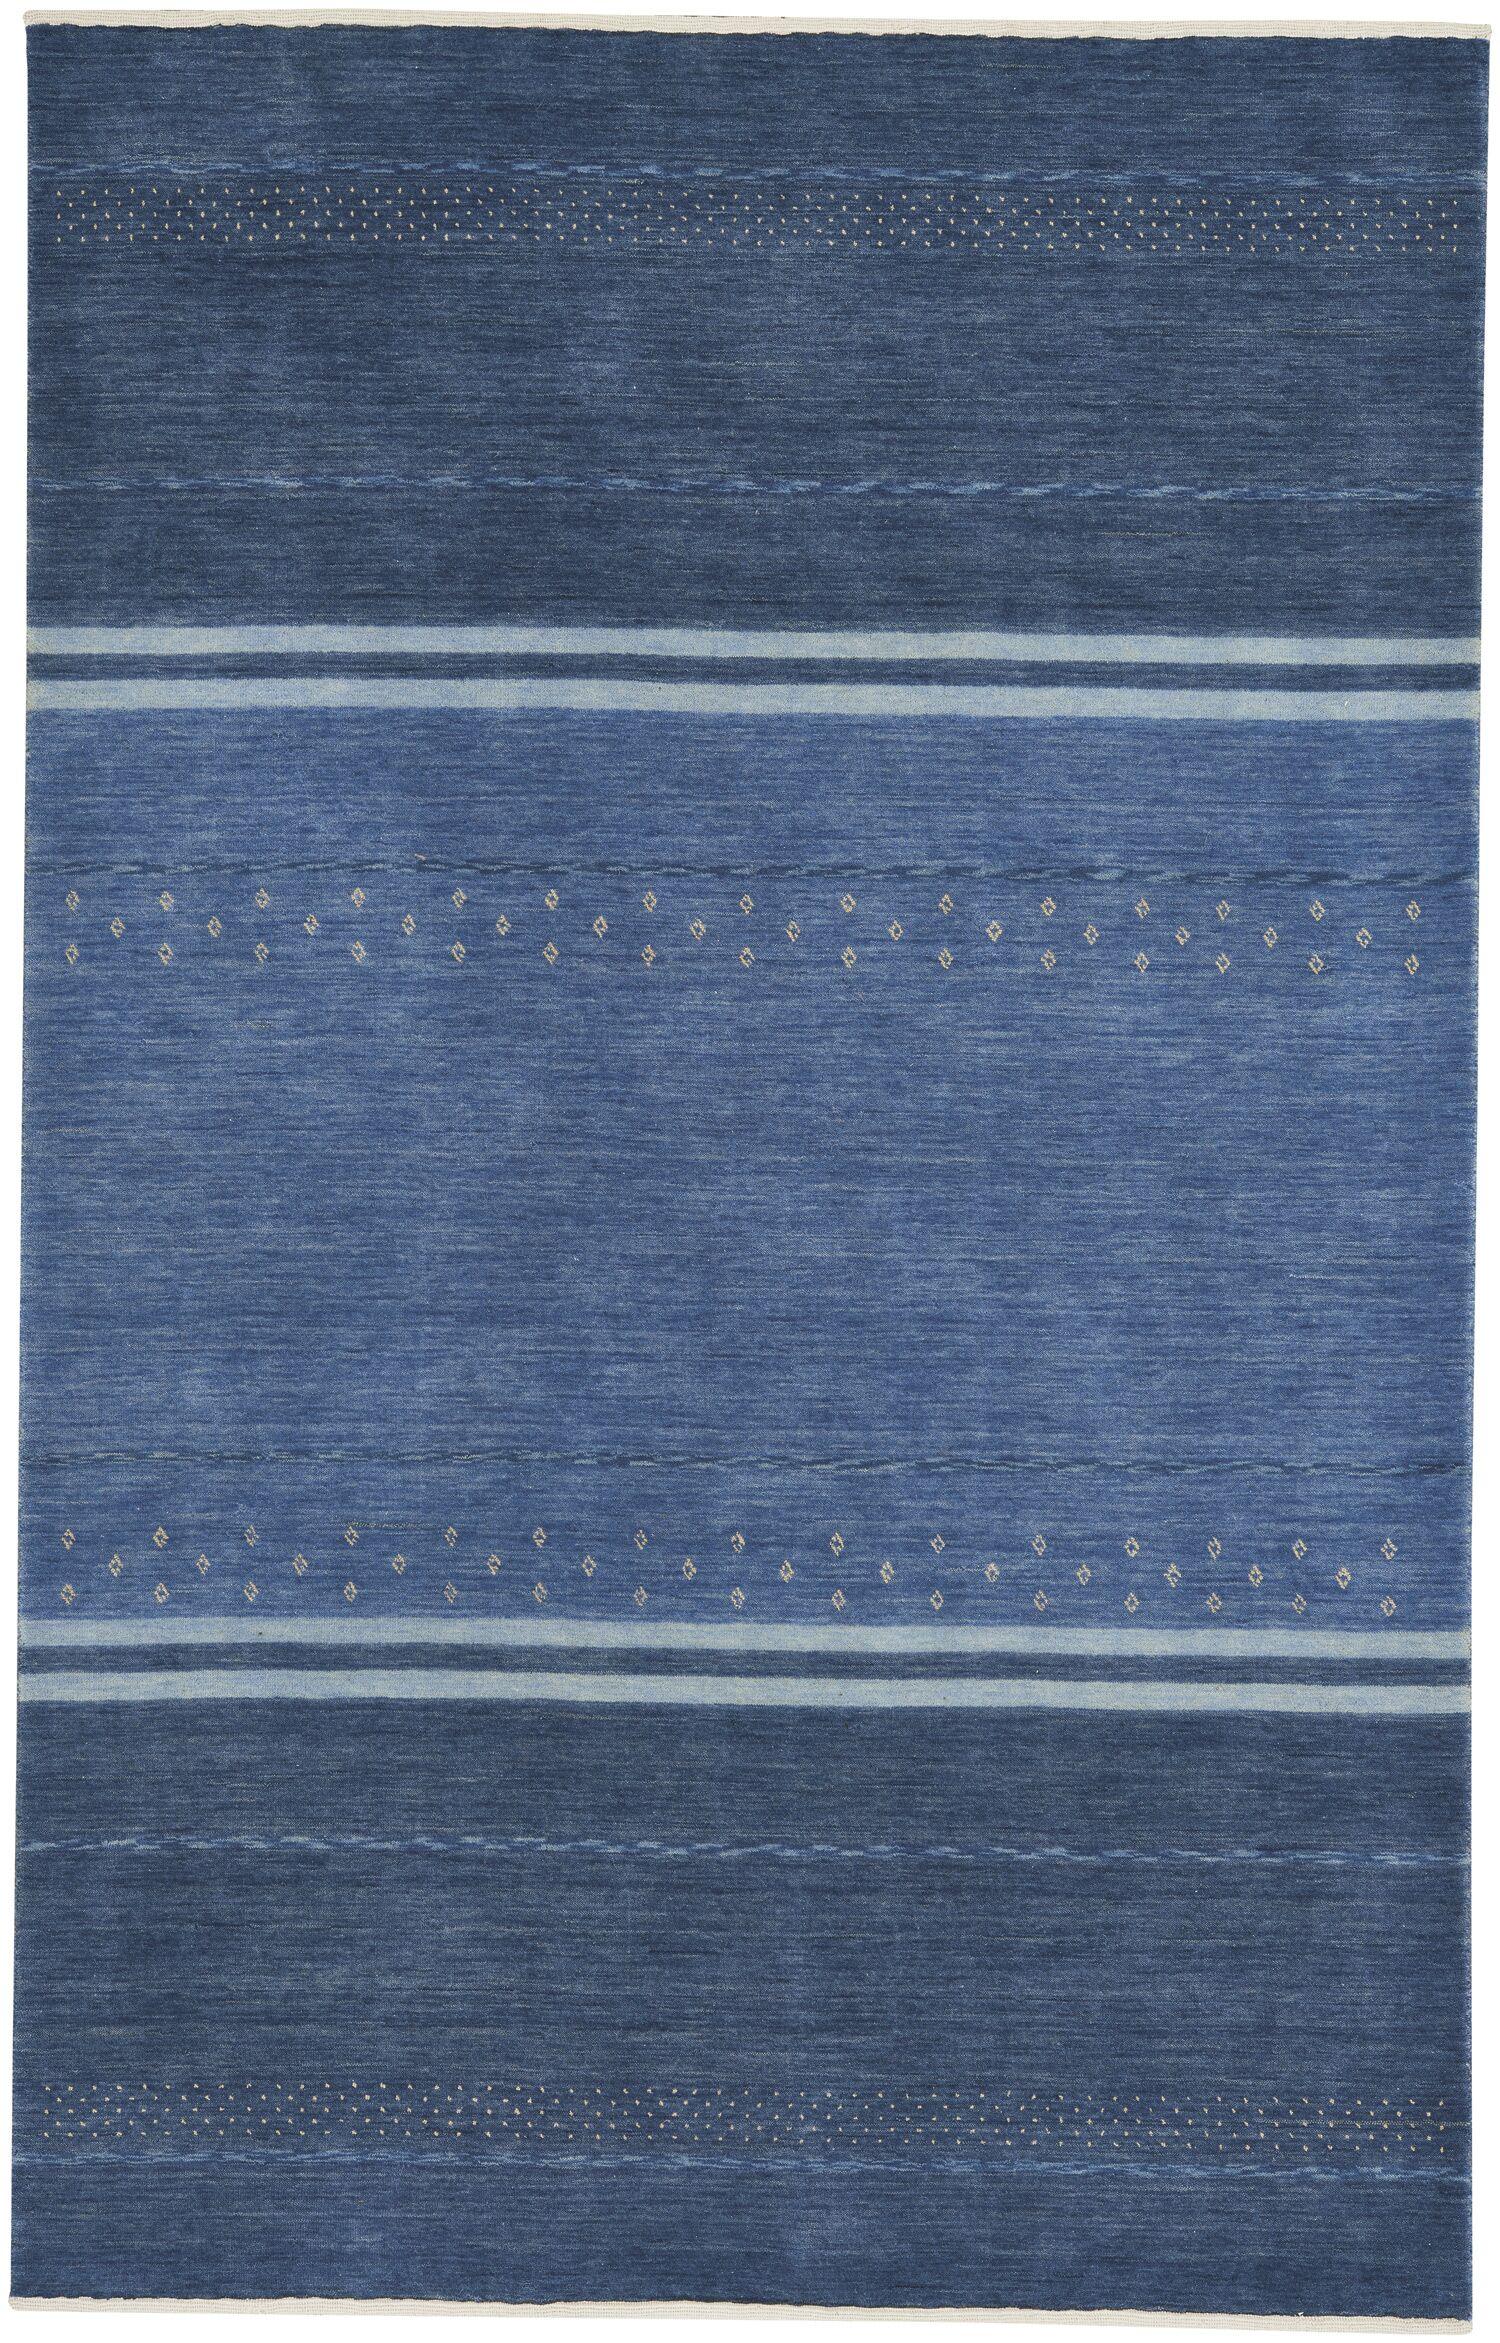 Gava Hand-Tufted Cobalt Area Rug Rug Size: 5' x 8'